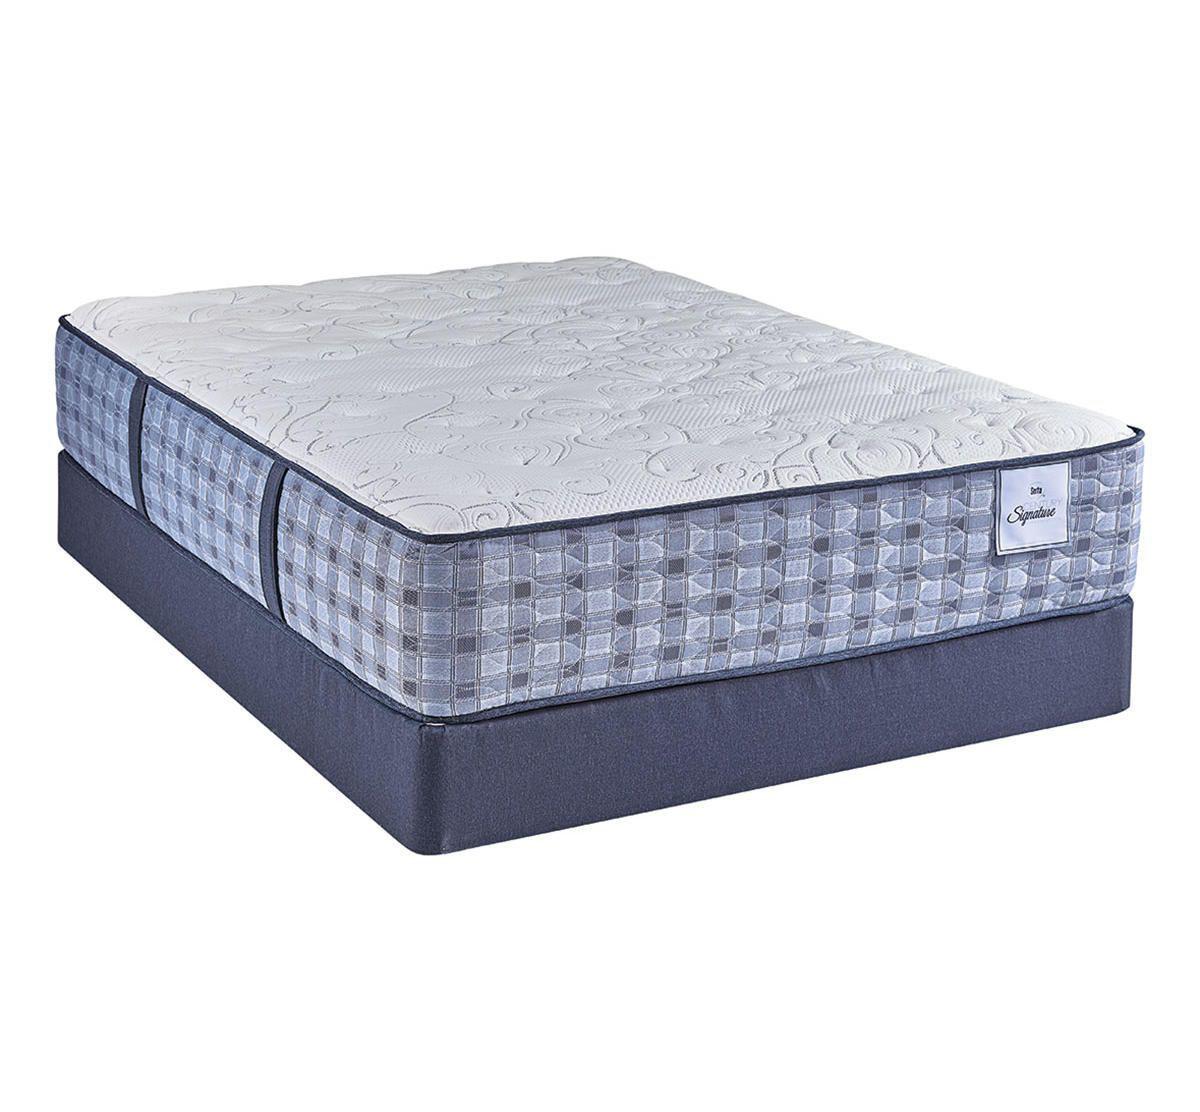 Twin Bed Mattress.Serta Renwood Plush Twin Xl Mattress Set